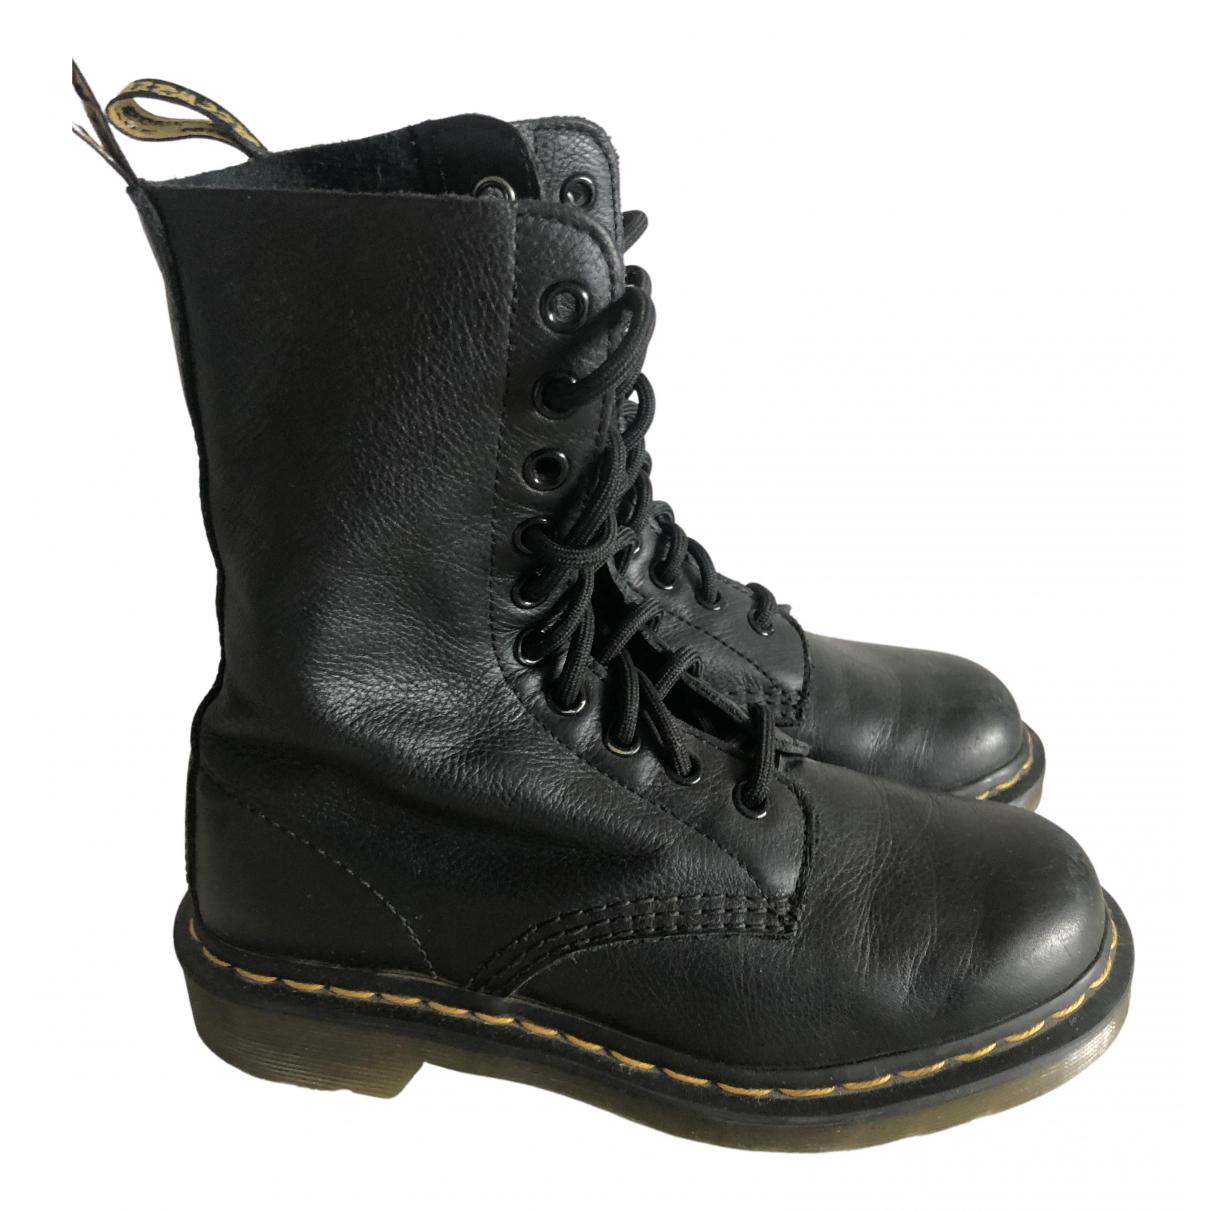 Dr. Martens 1490 (10 eye) Black Leather Boots for Women 3 UK